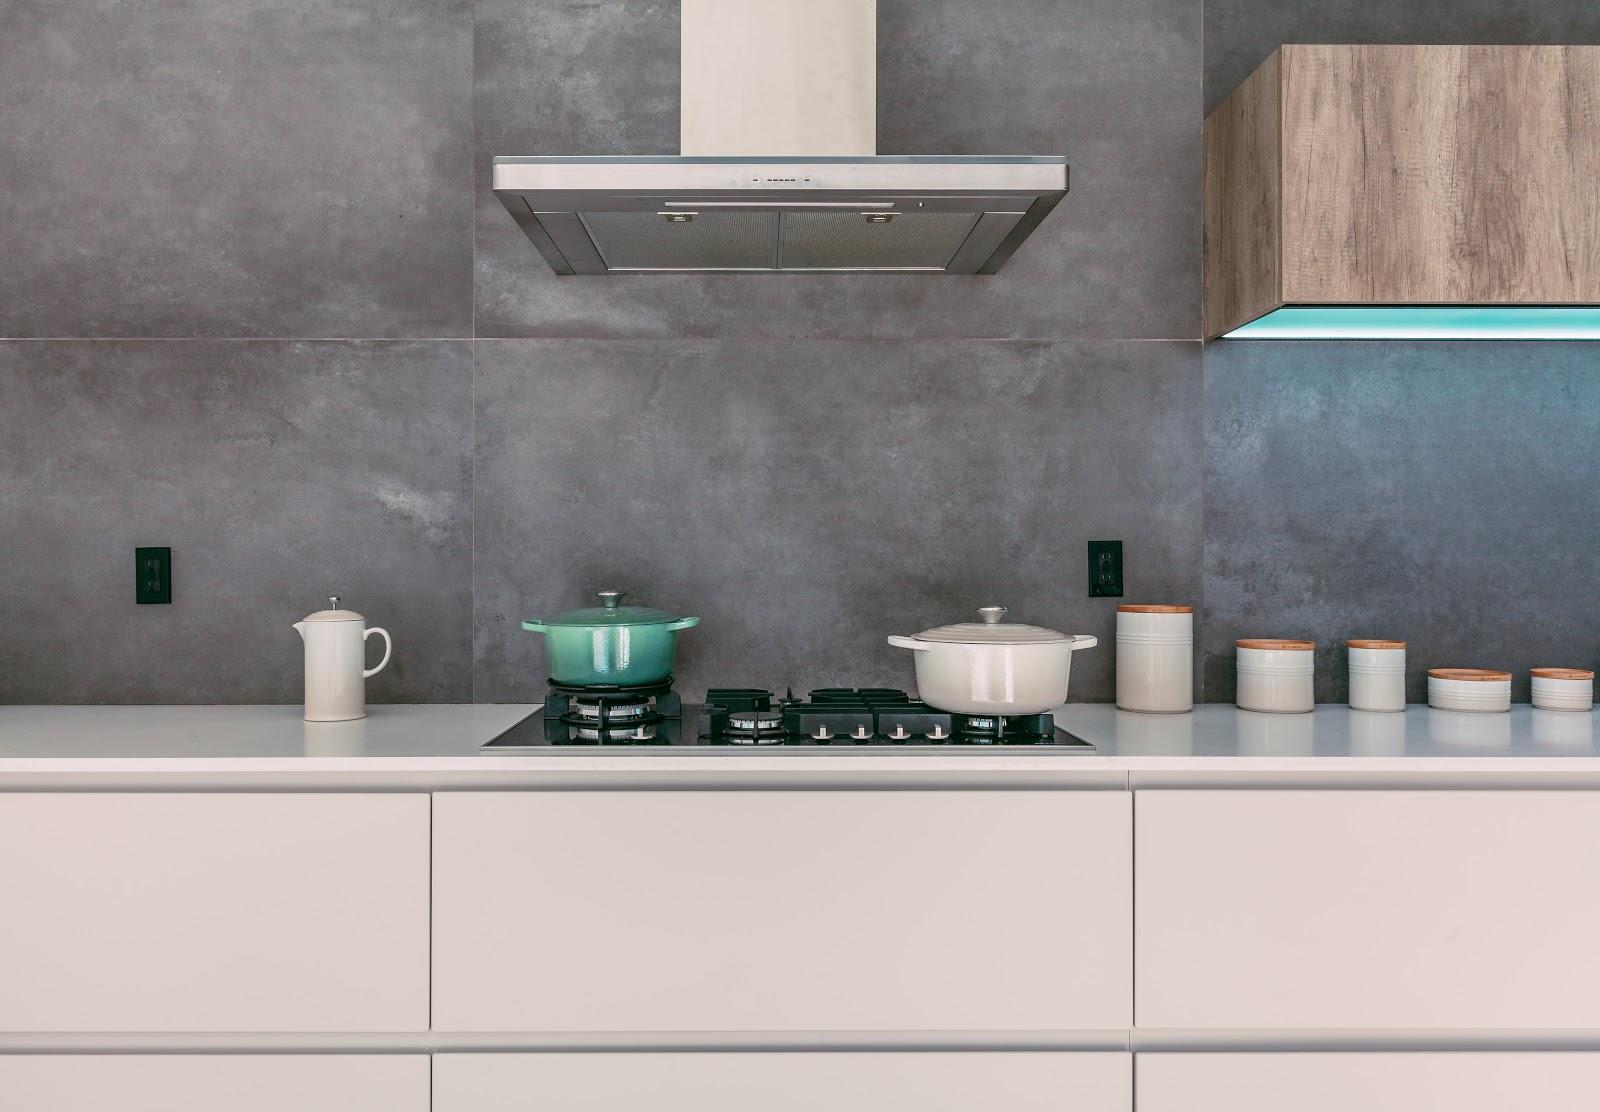 COVID-19 Impact On Virtual Kitchens In Dubai